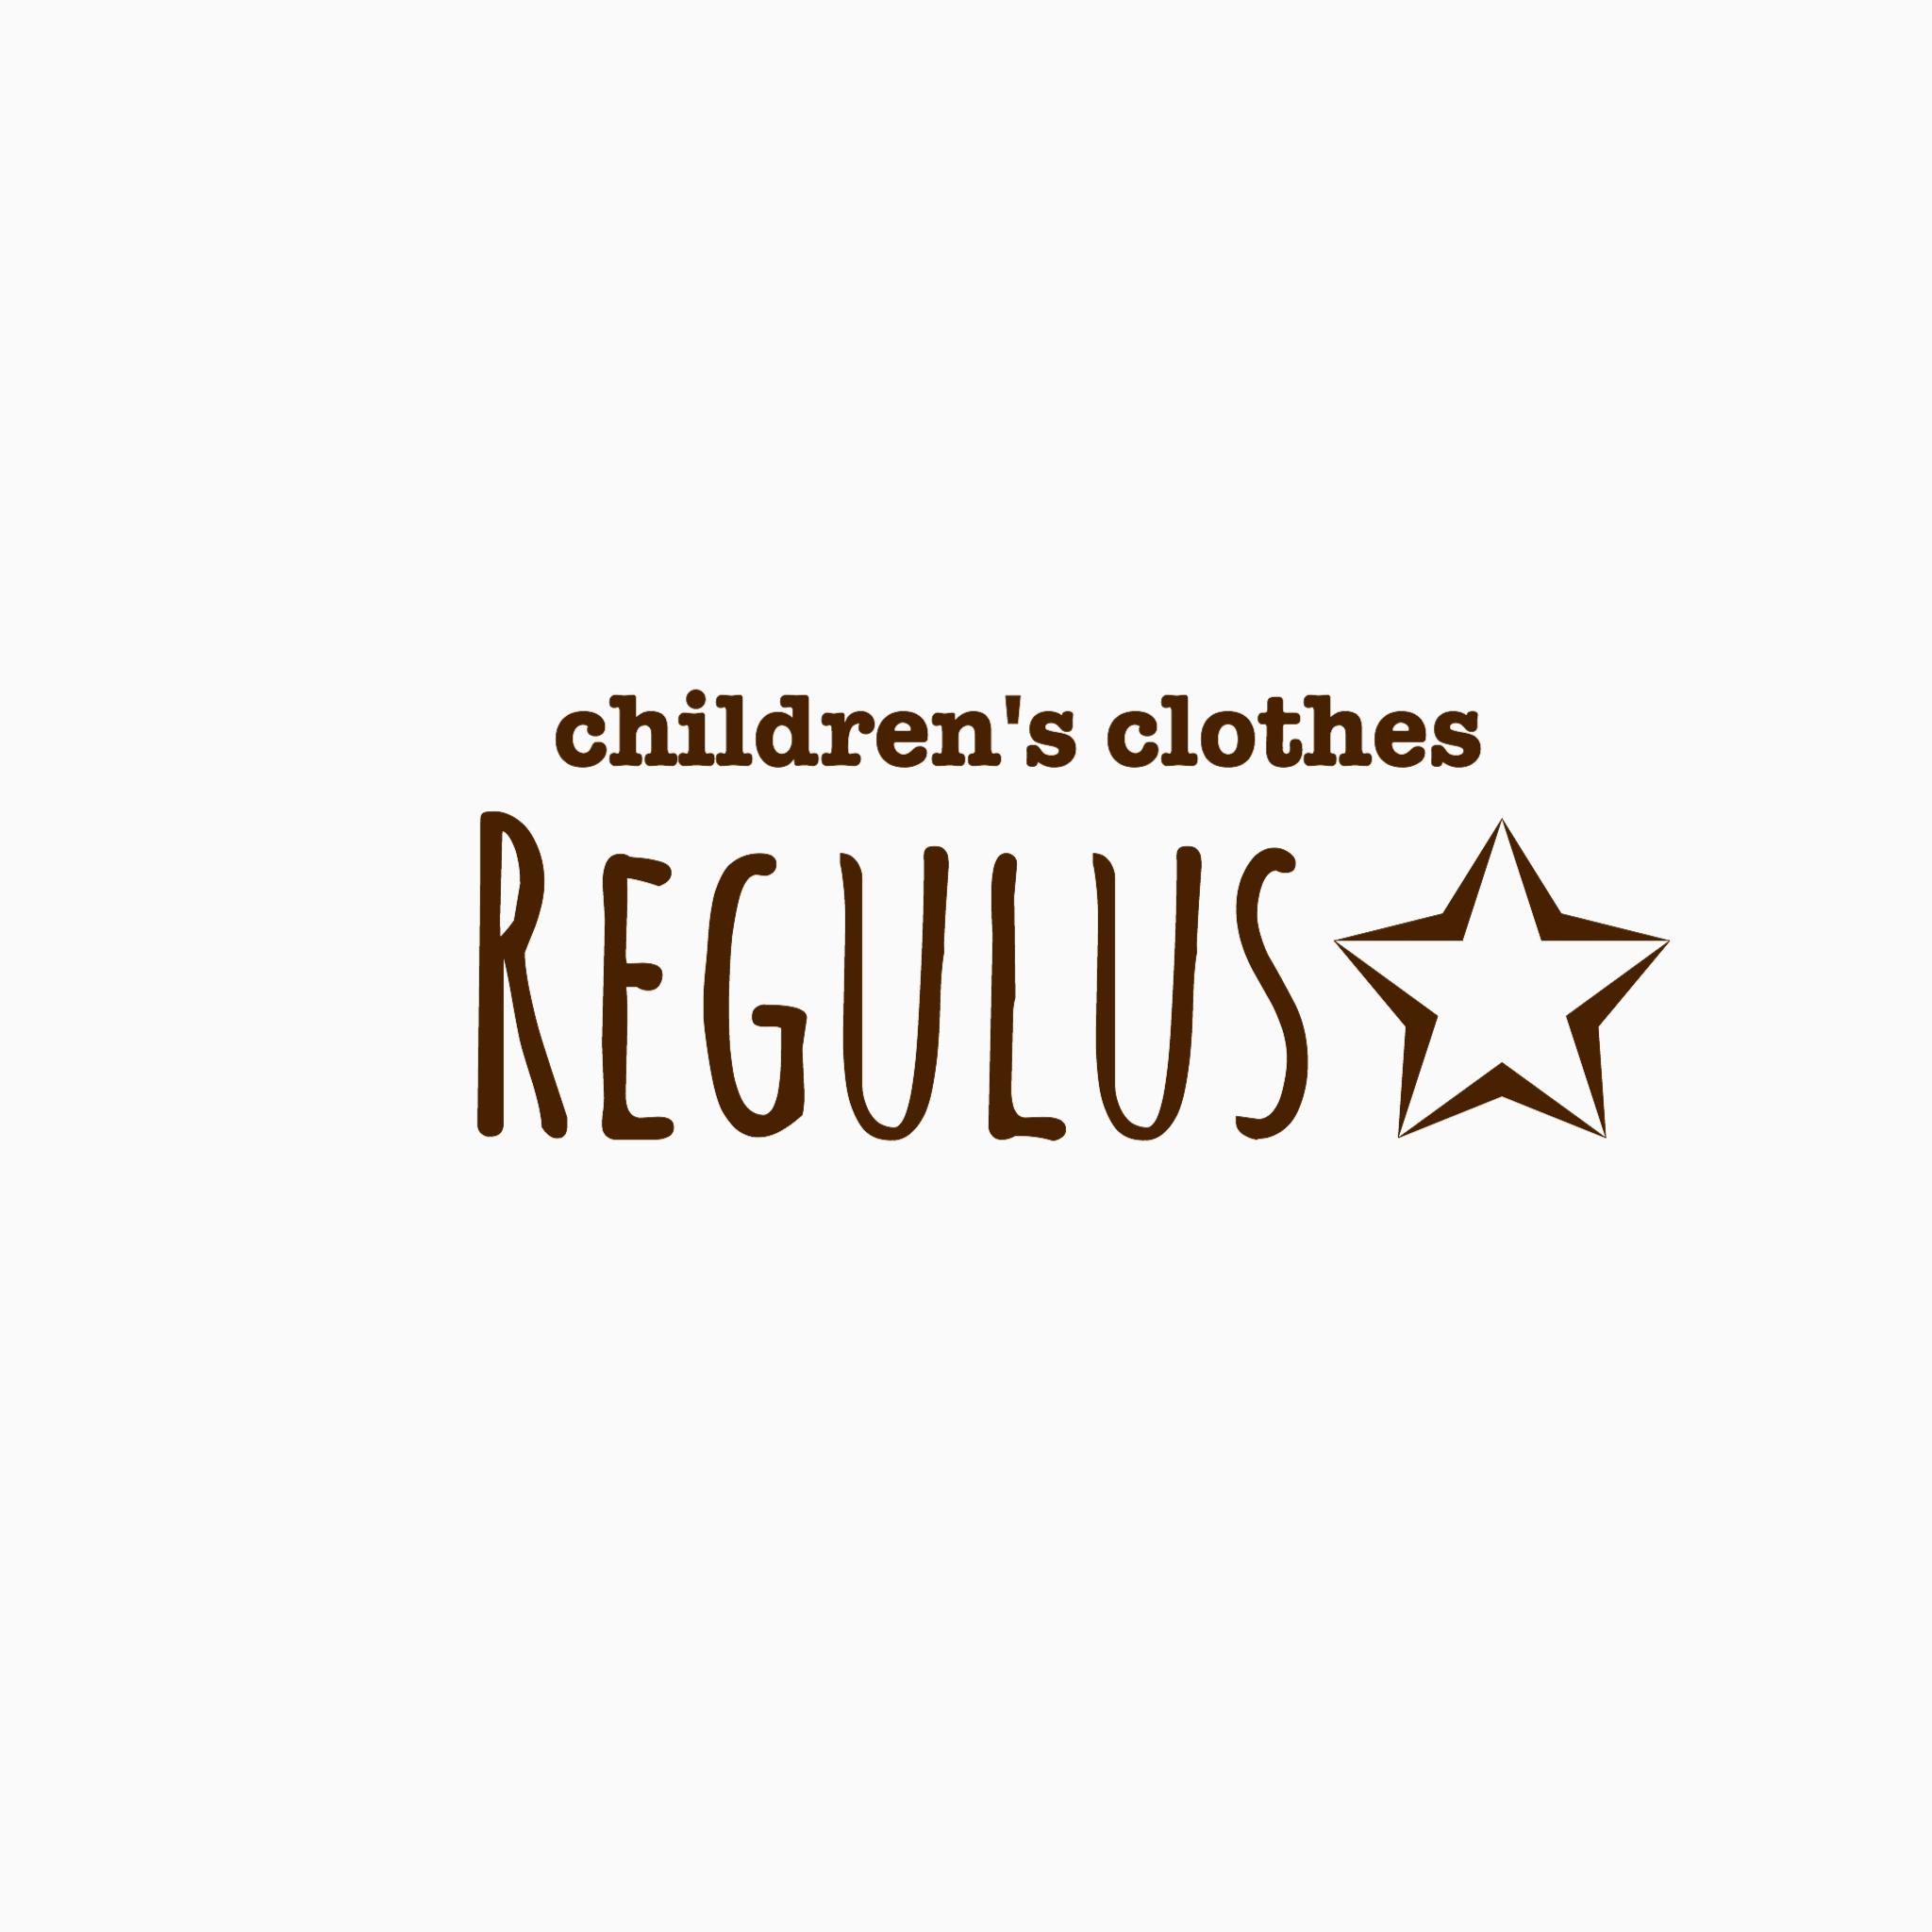 childrensclothes REGULUS